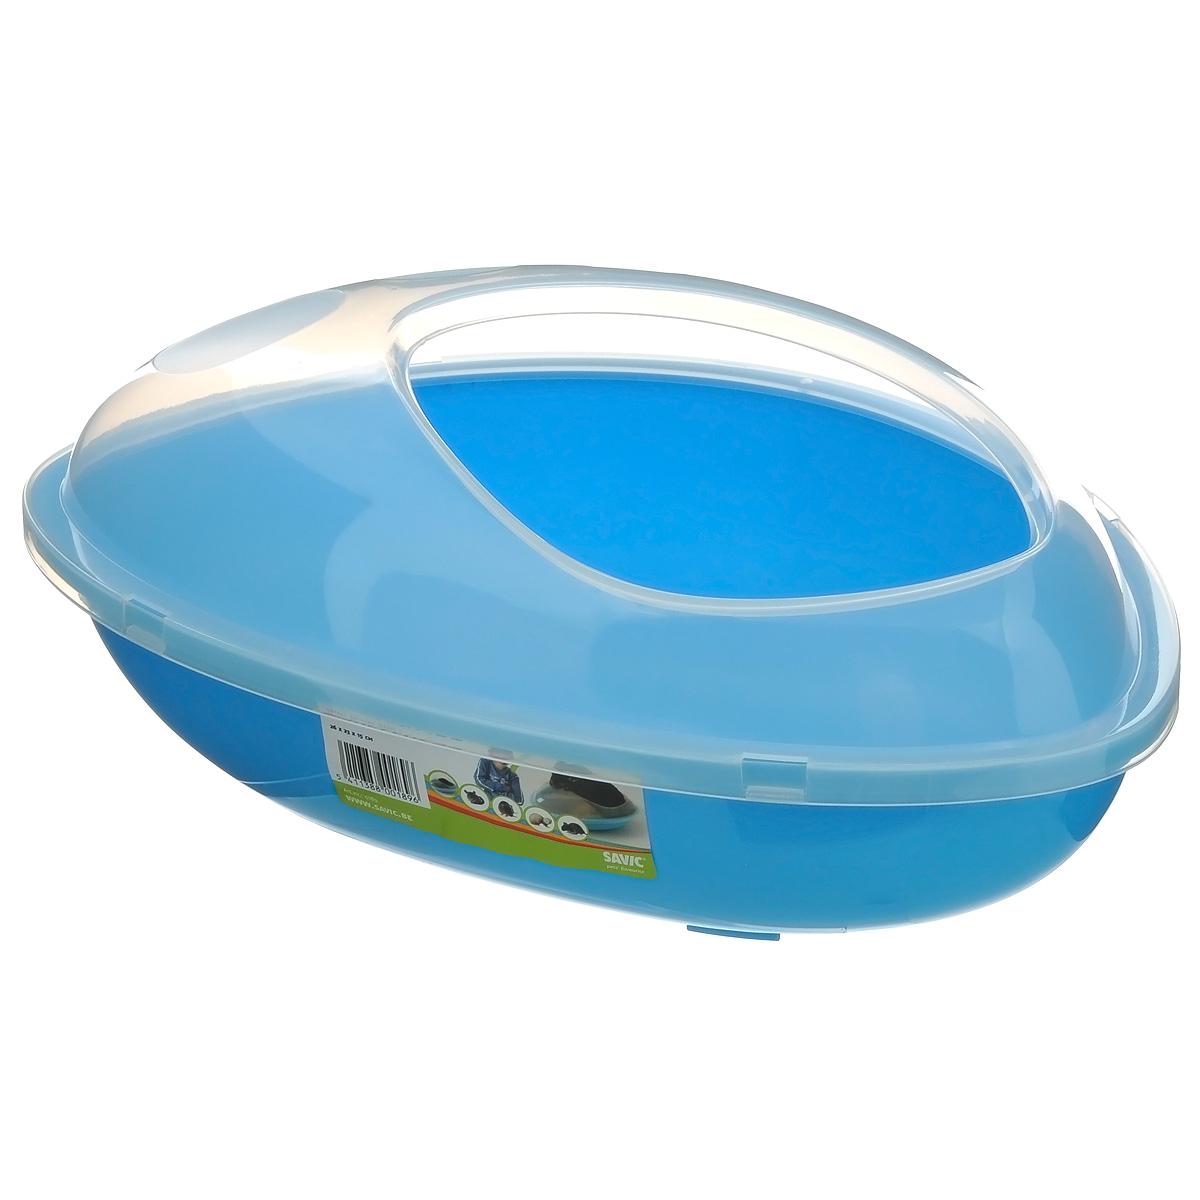 Купалка для шиншилл  Savik , цвет: голубой, 35 х 23 х 15 см - Товары для ухода (груминг)